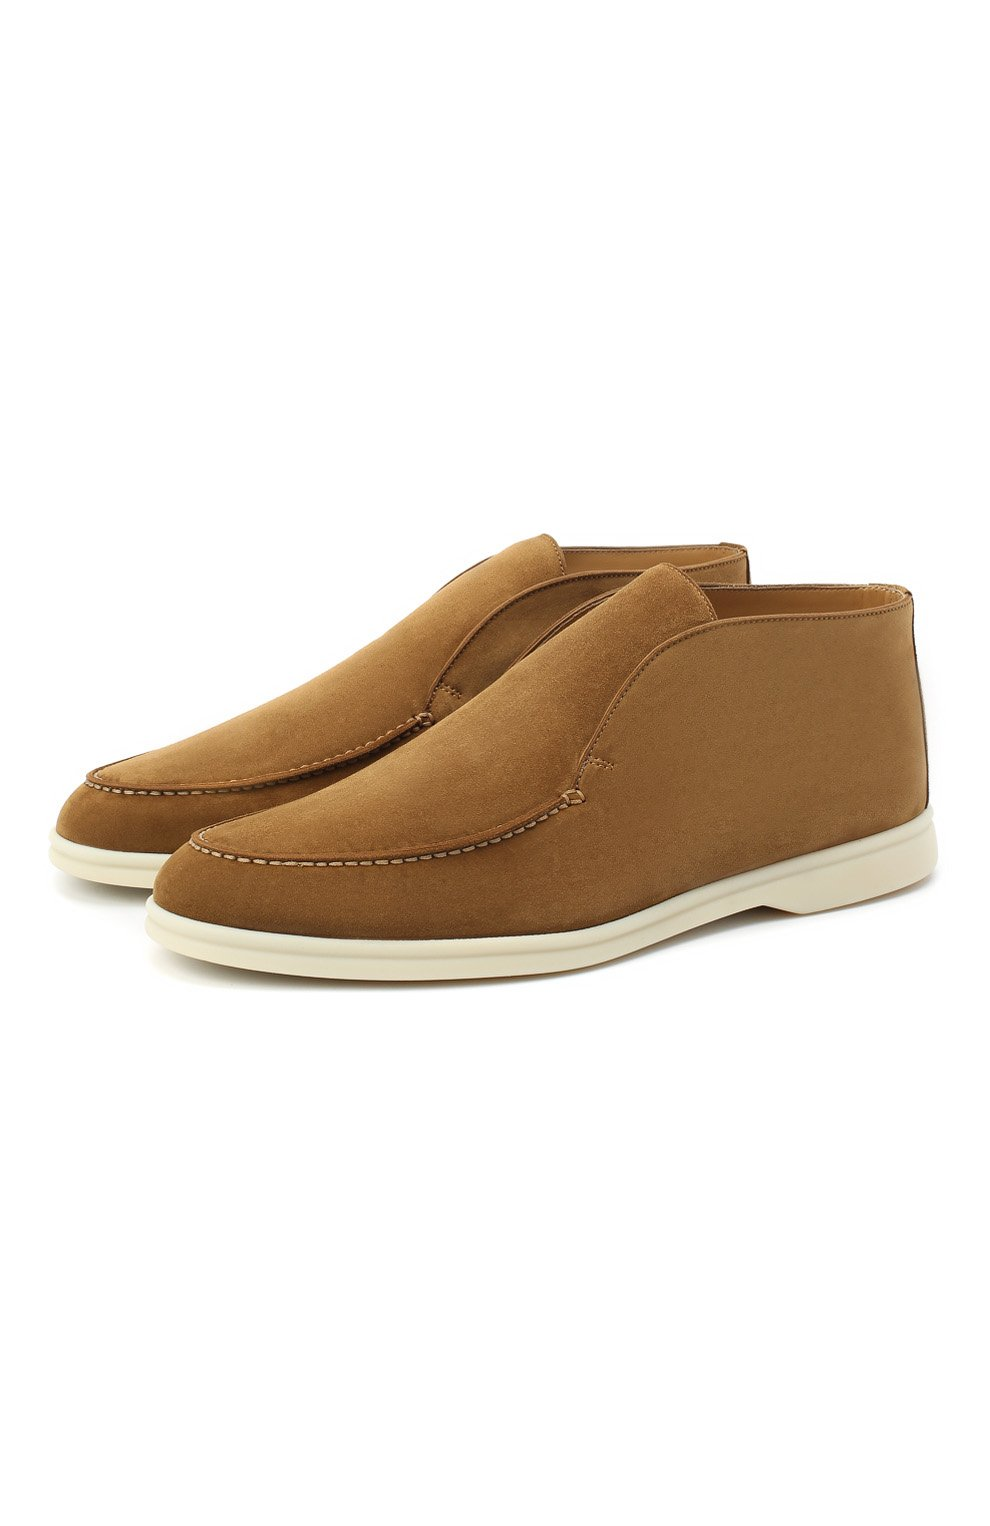 Мужские замшевые ботинки open walk LORO PIANA светло-коричневого цвета, арт. FAB4368 | Фото 1